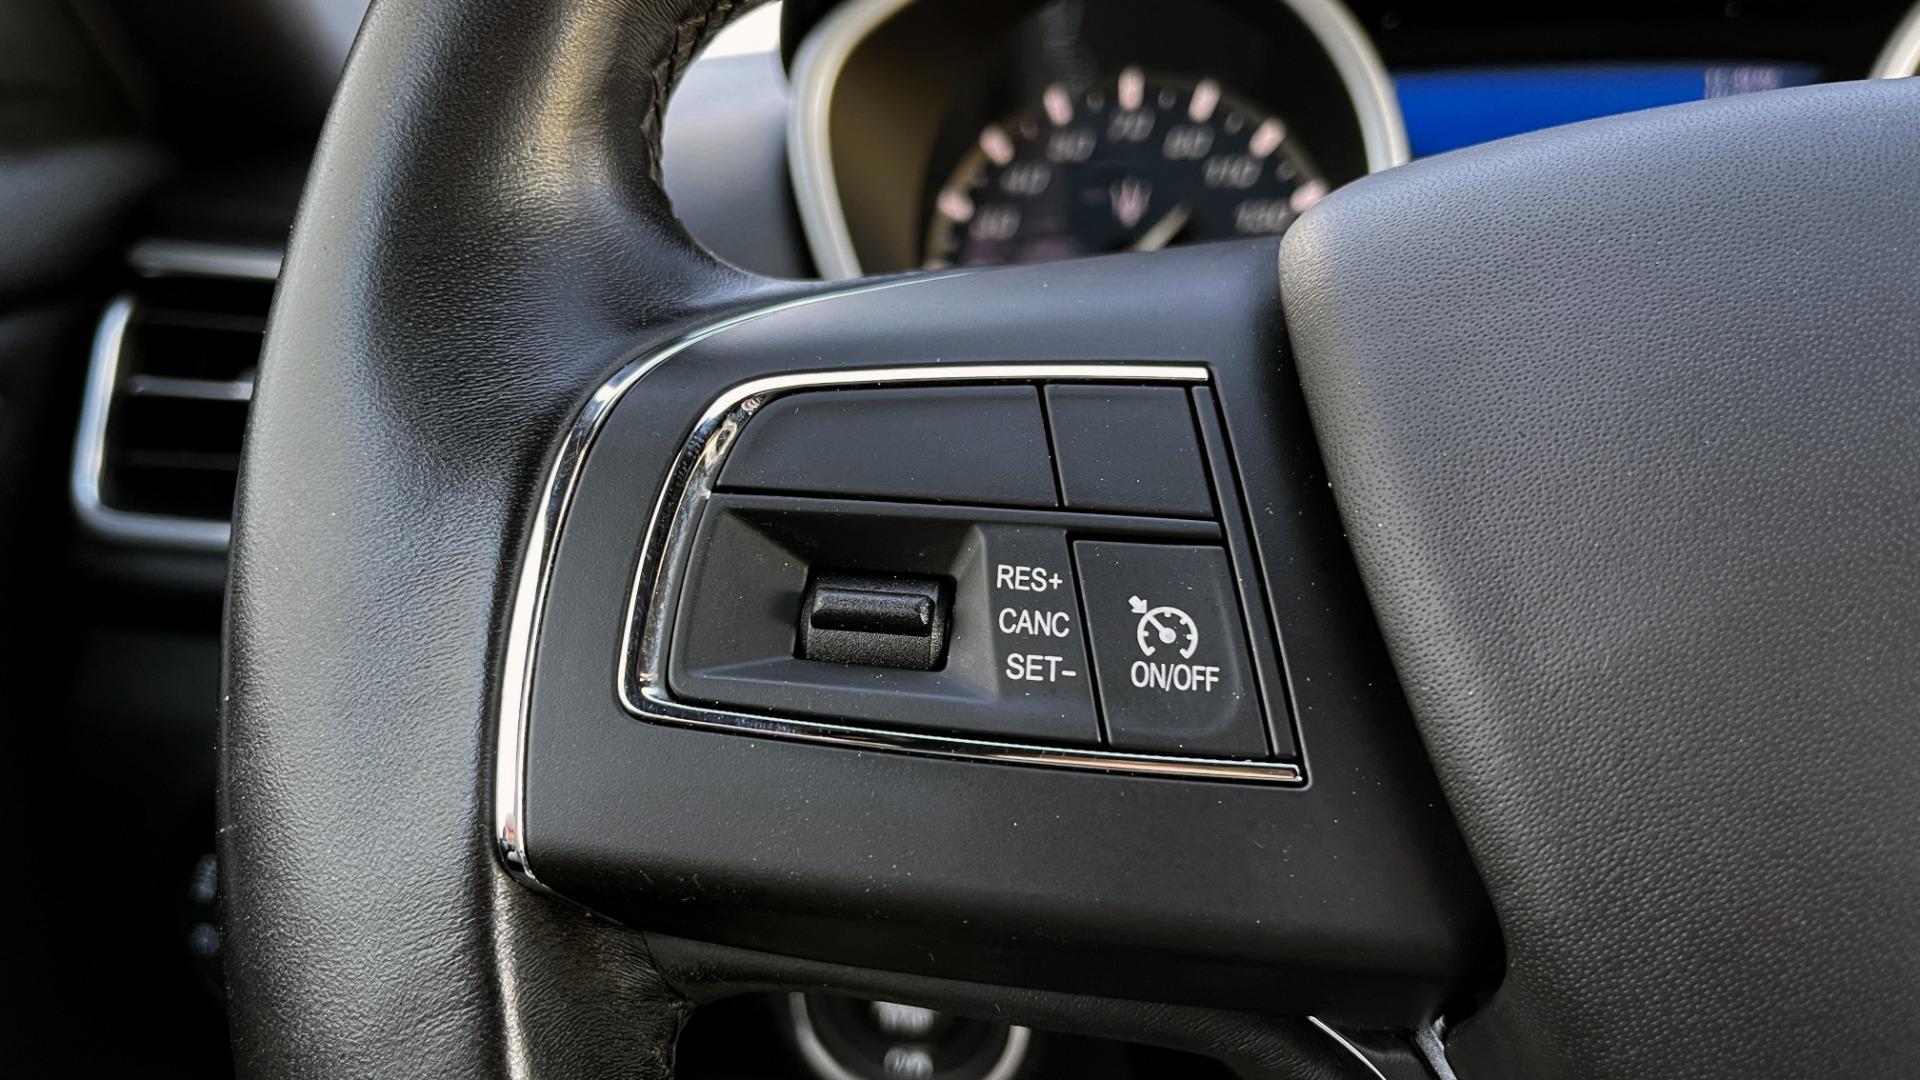 Used 2018 Maserati GHIBLI SEDAN / RWD / 3.0L V6 / SUNROOF / NAV / REARVIEW for sale $42,995 at Formula Imports in Charlotte NC 28227 34